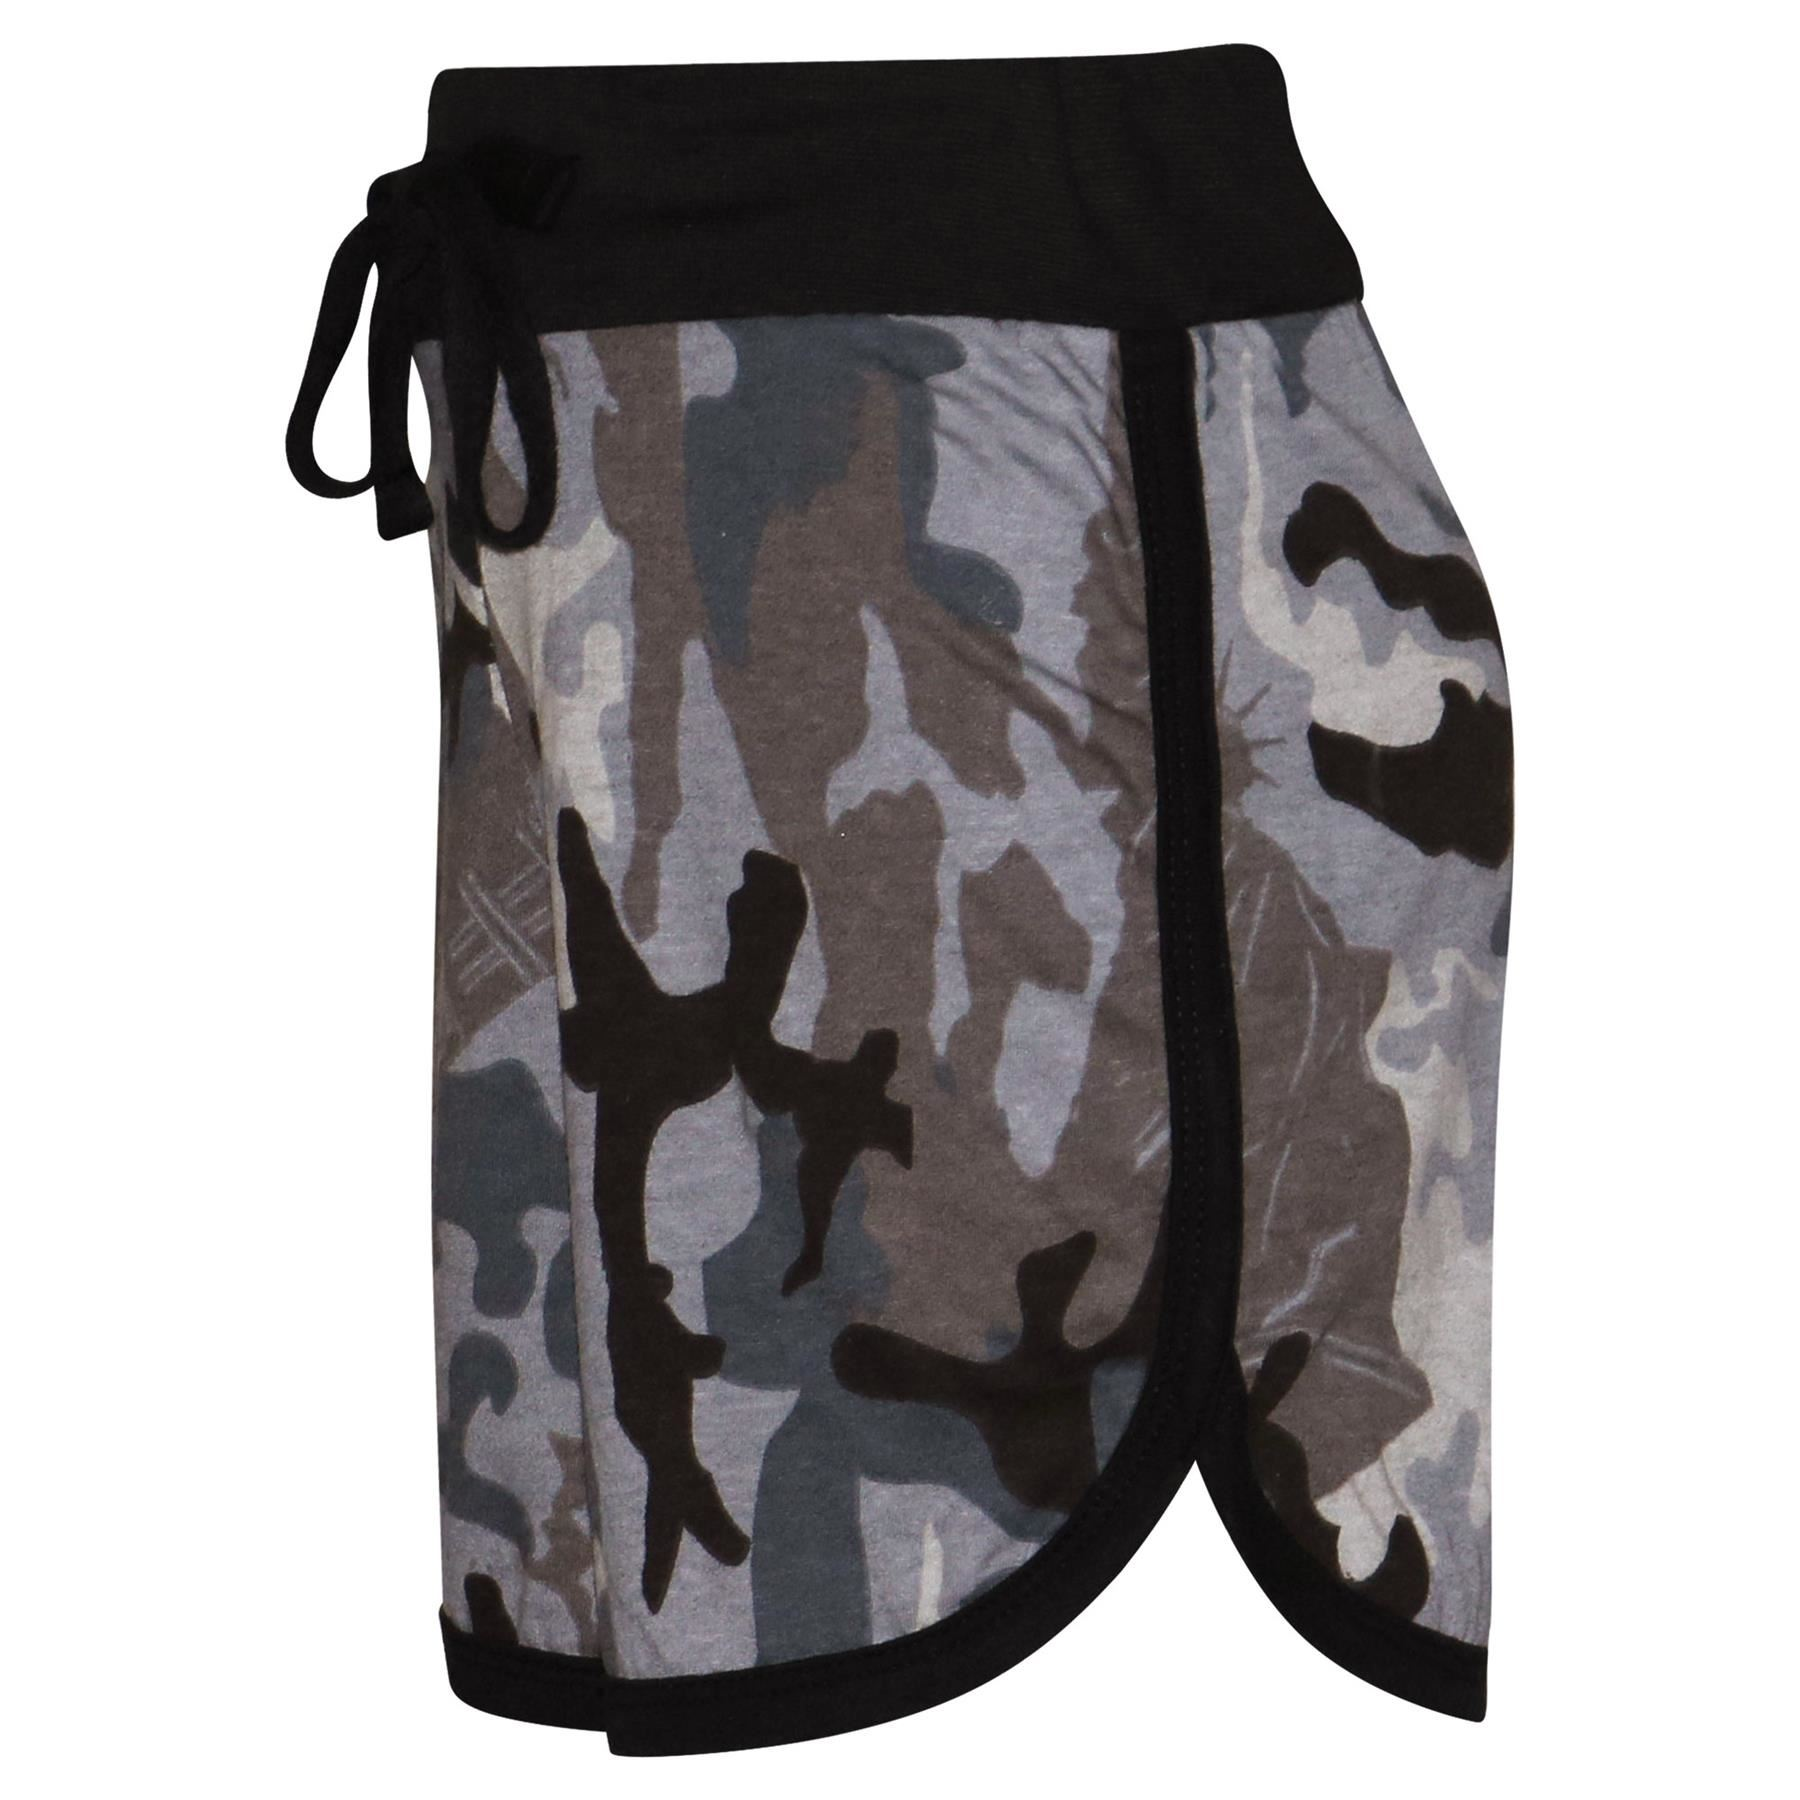 Kids-Girls-Shorts-100-Cotton-Dance-Gym-Sports-Summer-Hot-Short-Pants-2-13-Years Indexbild 17